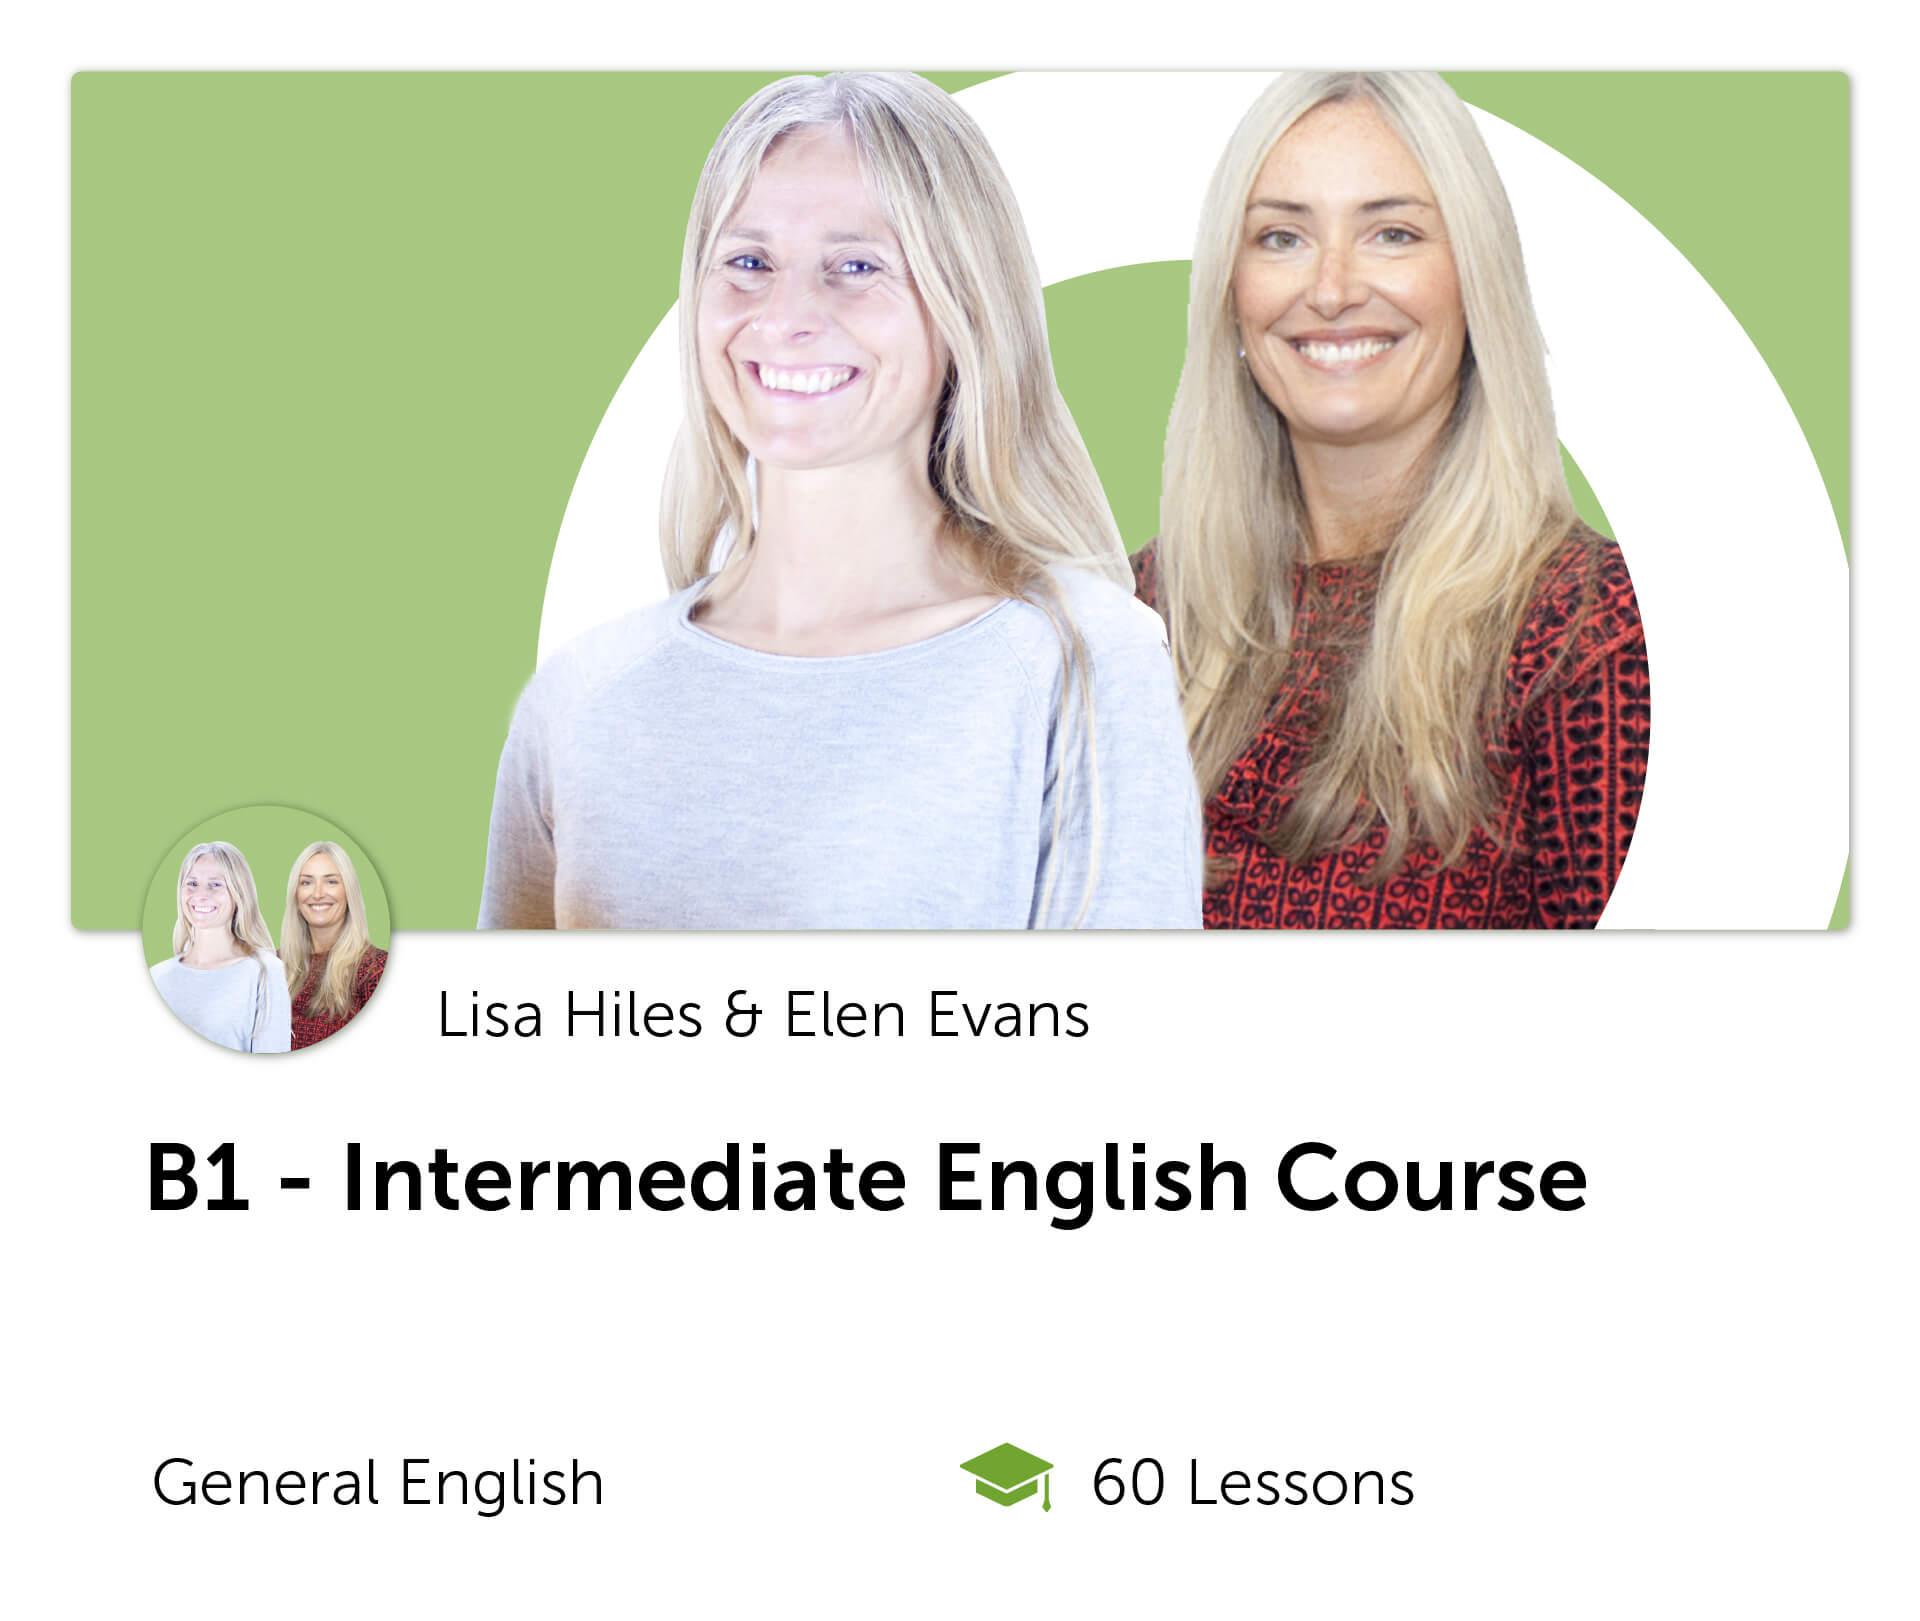 B1 Intermediate English Course